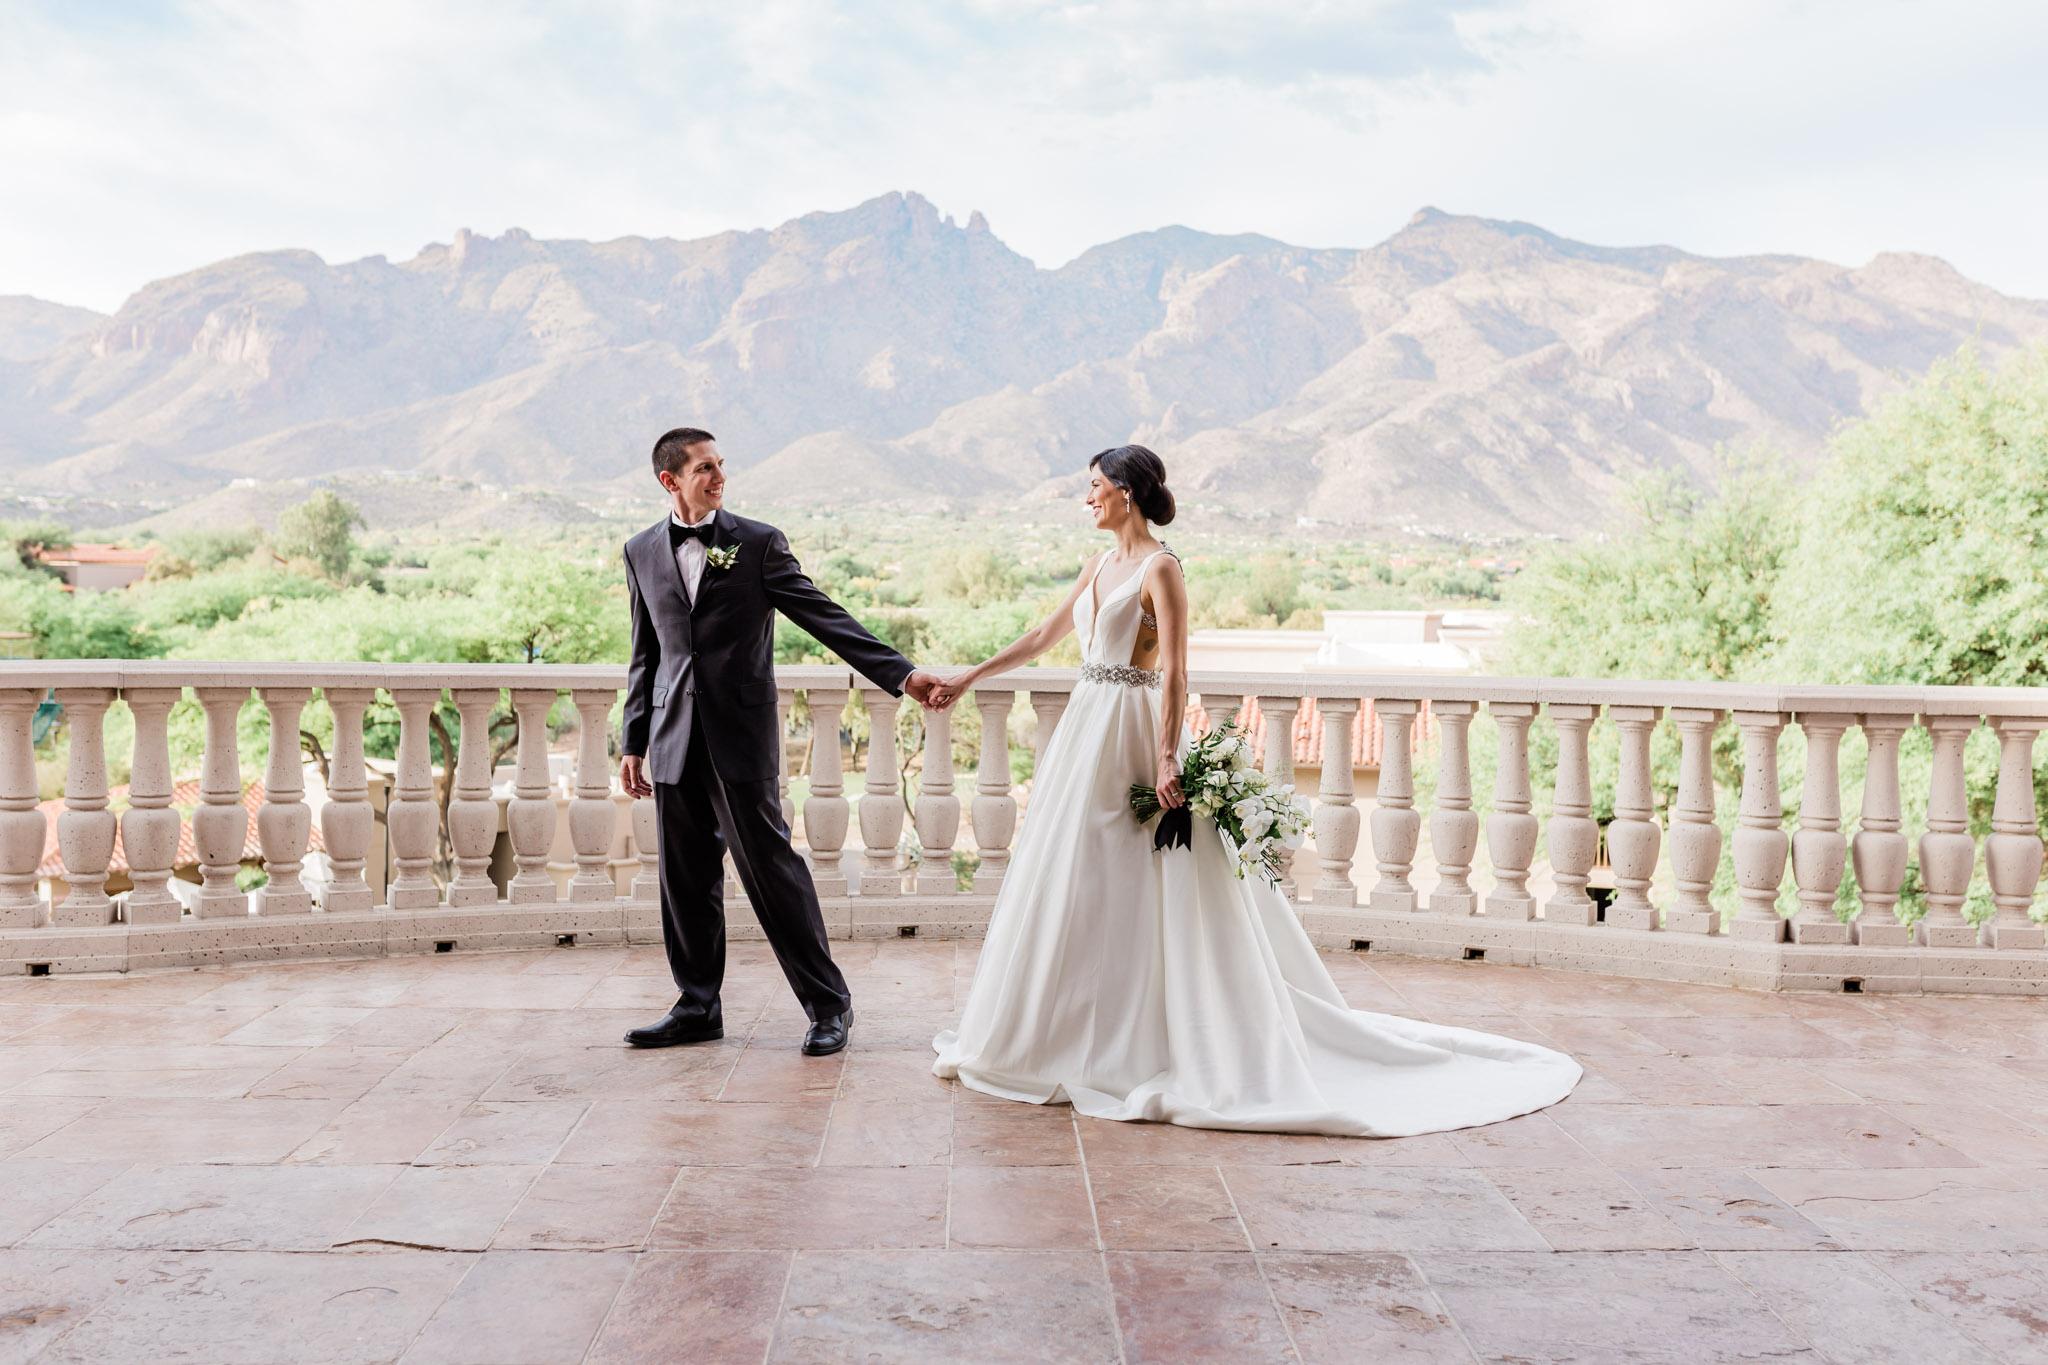 tucson wedding photography jlw for web  8.jpg